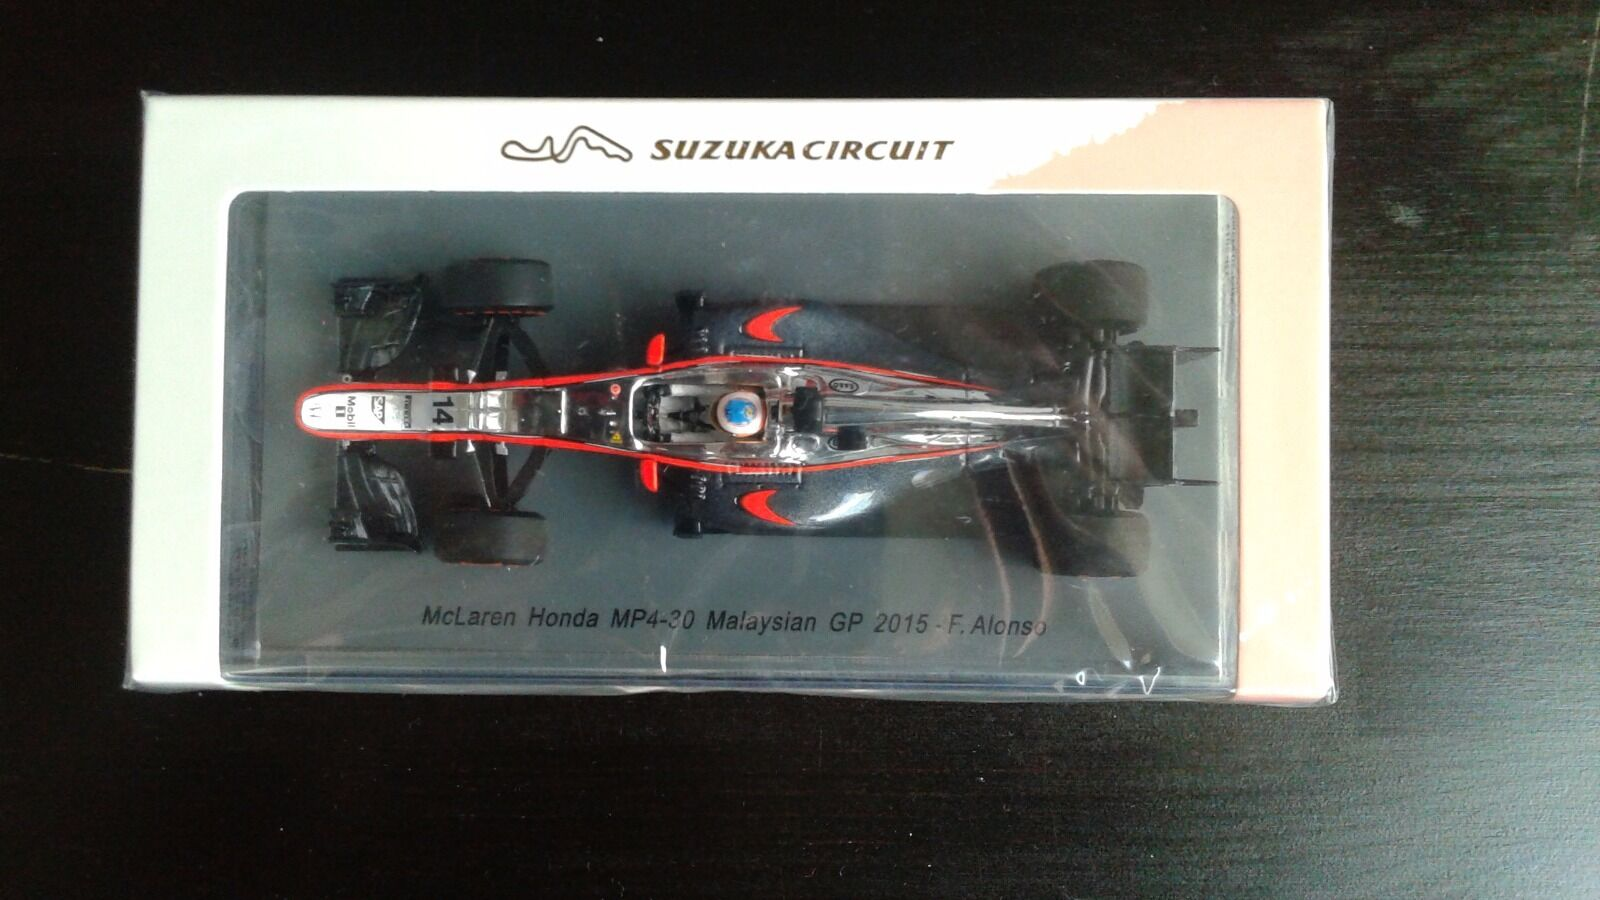 McLaren Honda MP4-30, Fernando Alonso Malaysian GP 2015 2015 2015 Suzuka circuit 1/43 | Insolite  d98773